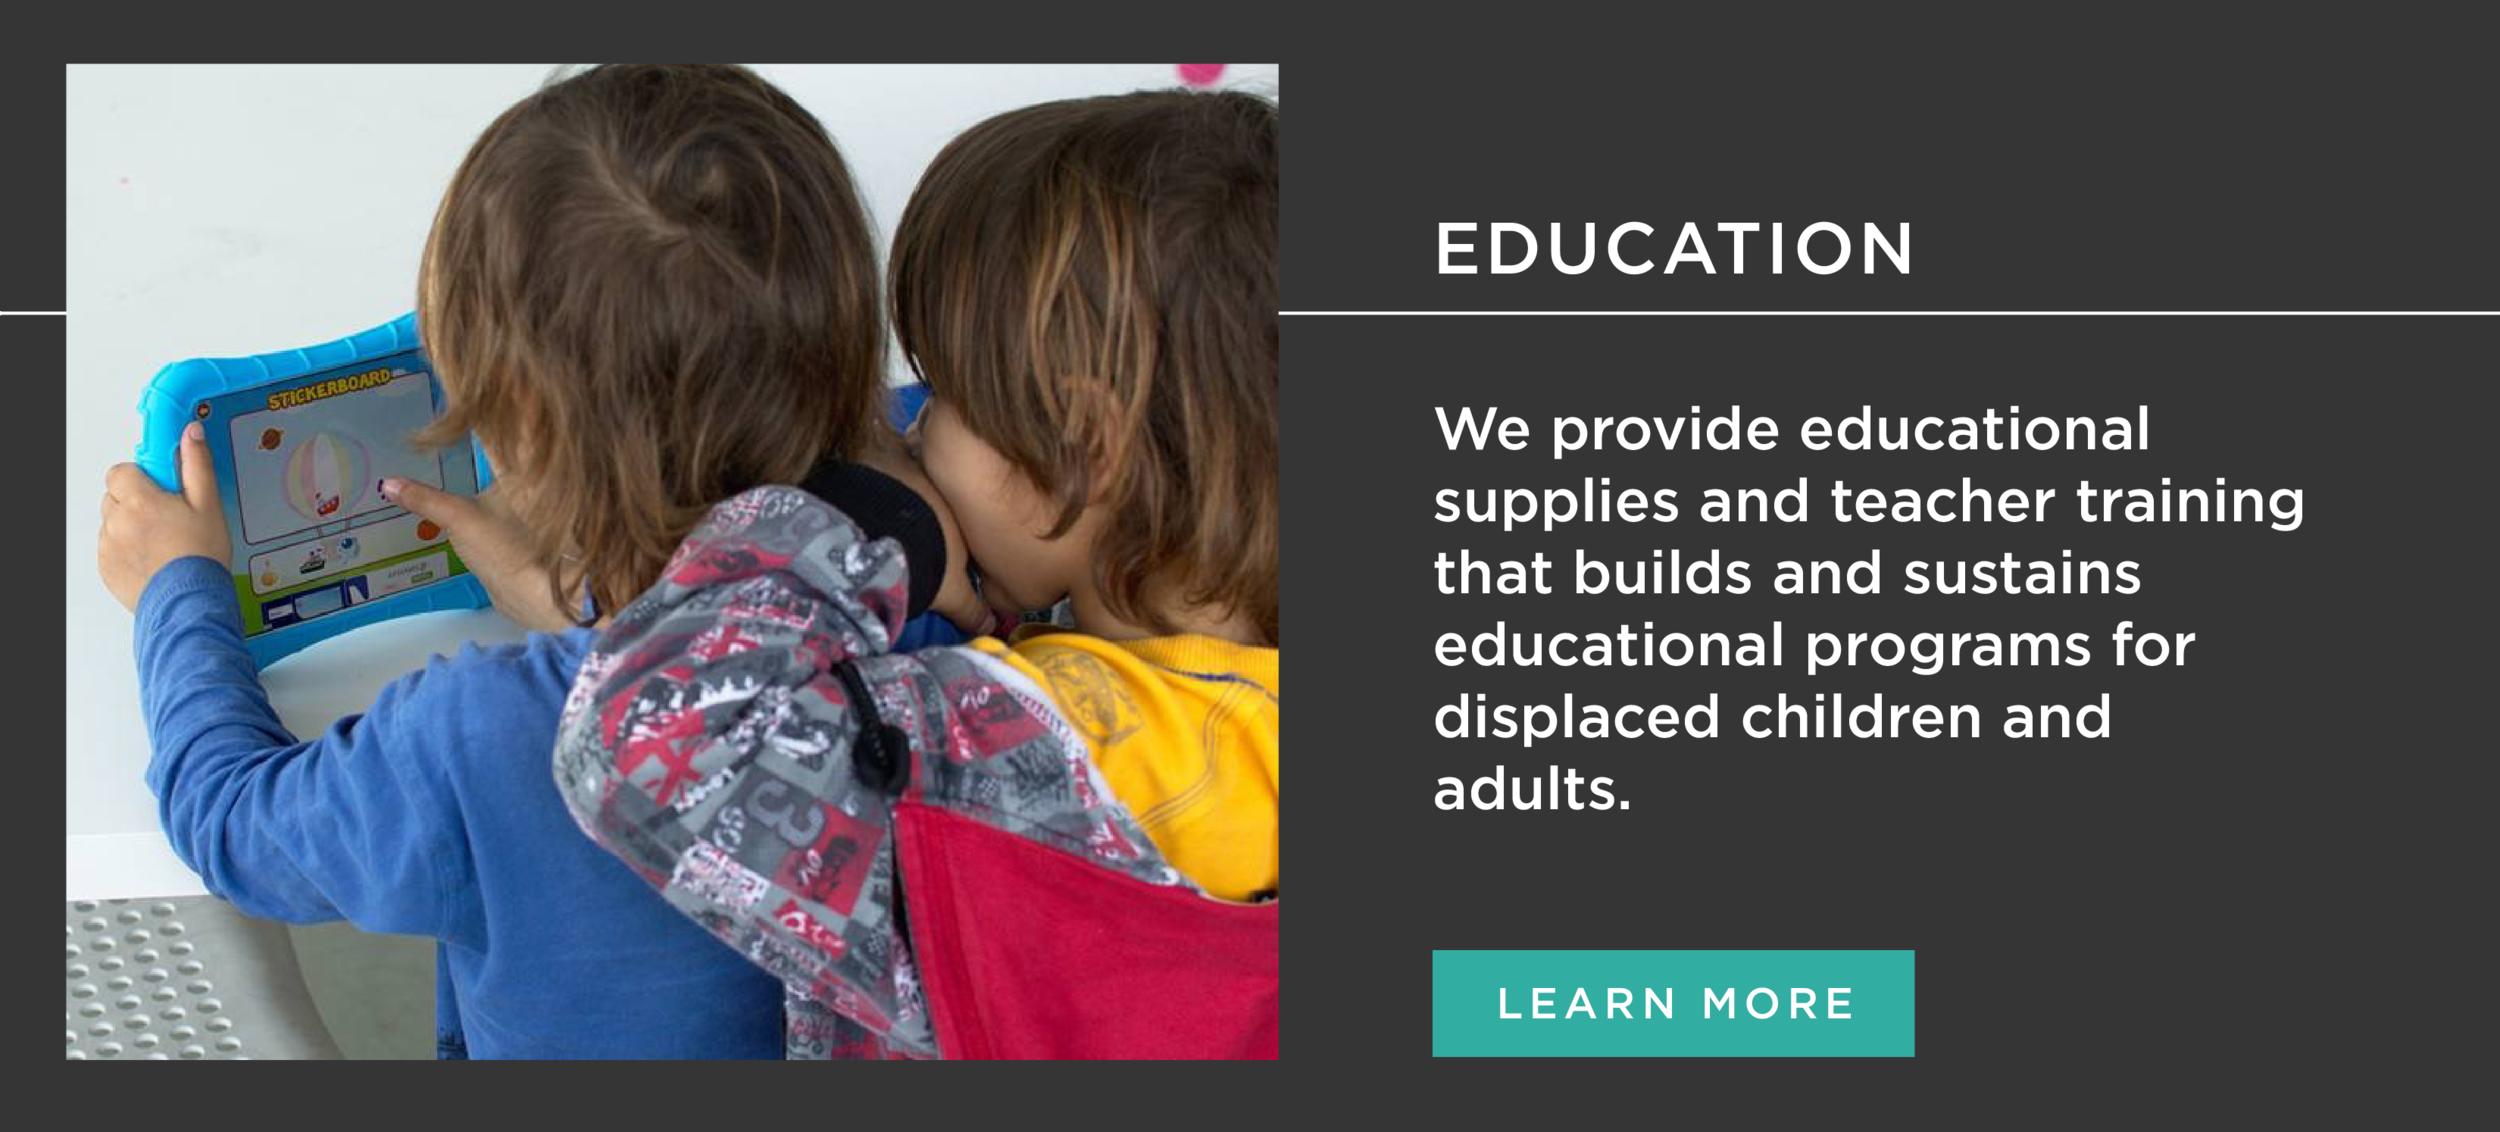 PH_Icons_Slideshow_Education.png